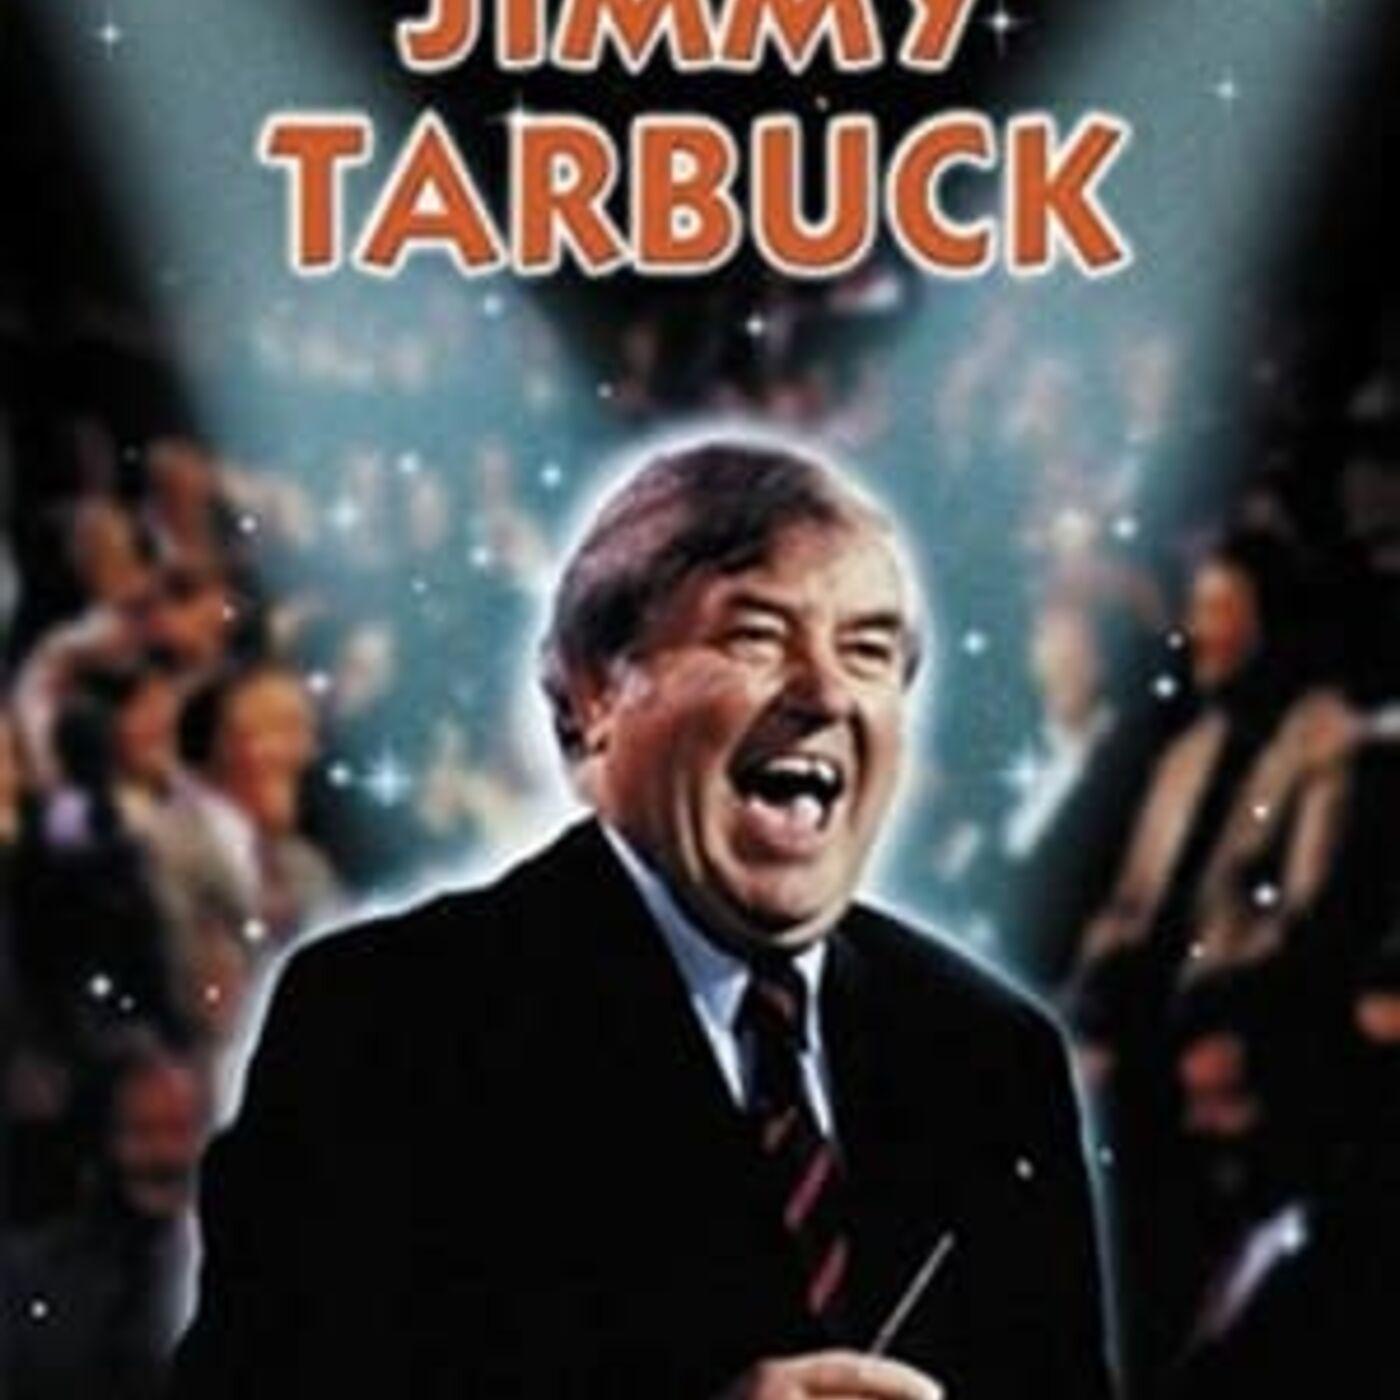 Jimmy Tarbuck OBE, Eyes & Teeth - The Water Rats - Season 8 - Edition 17